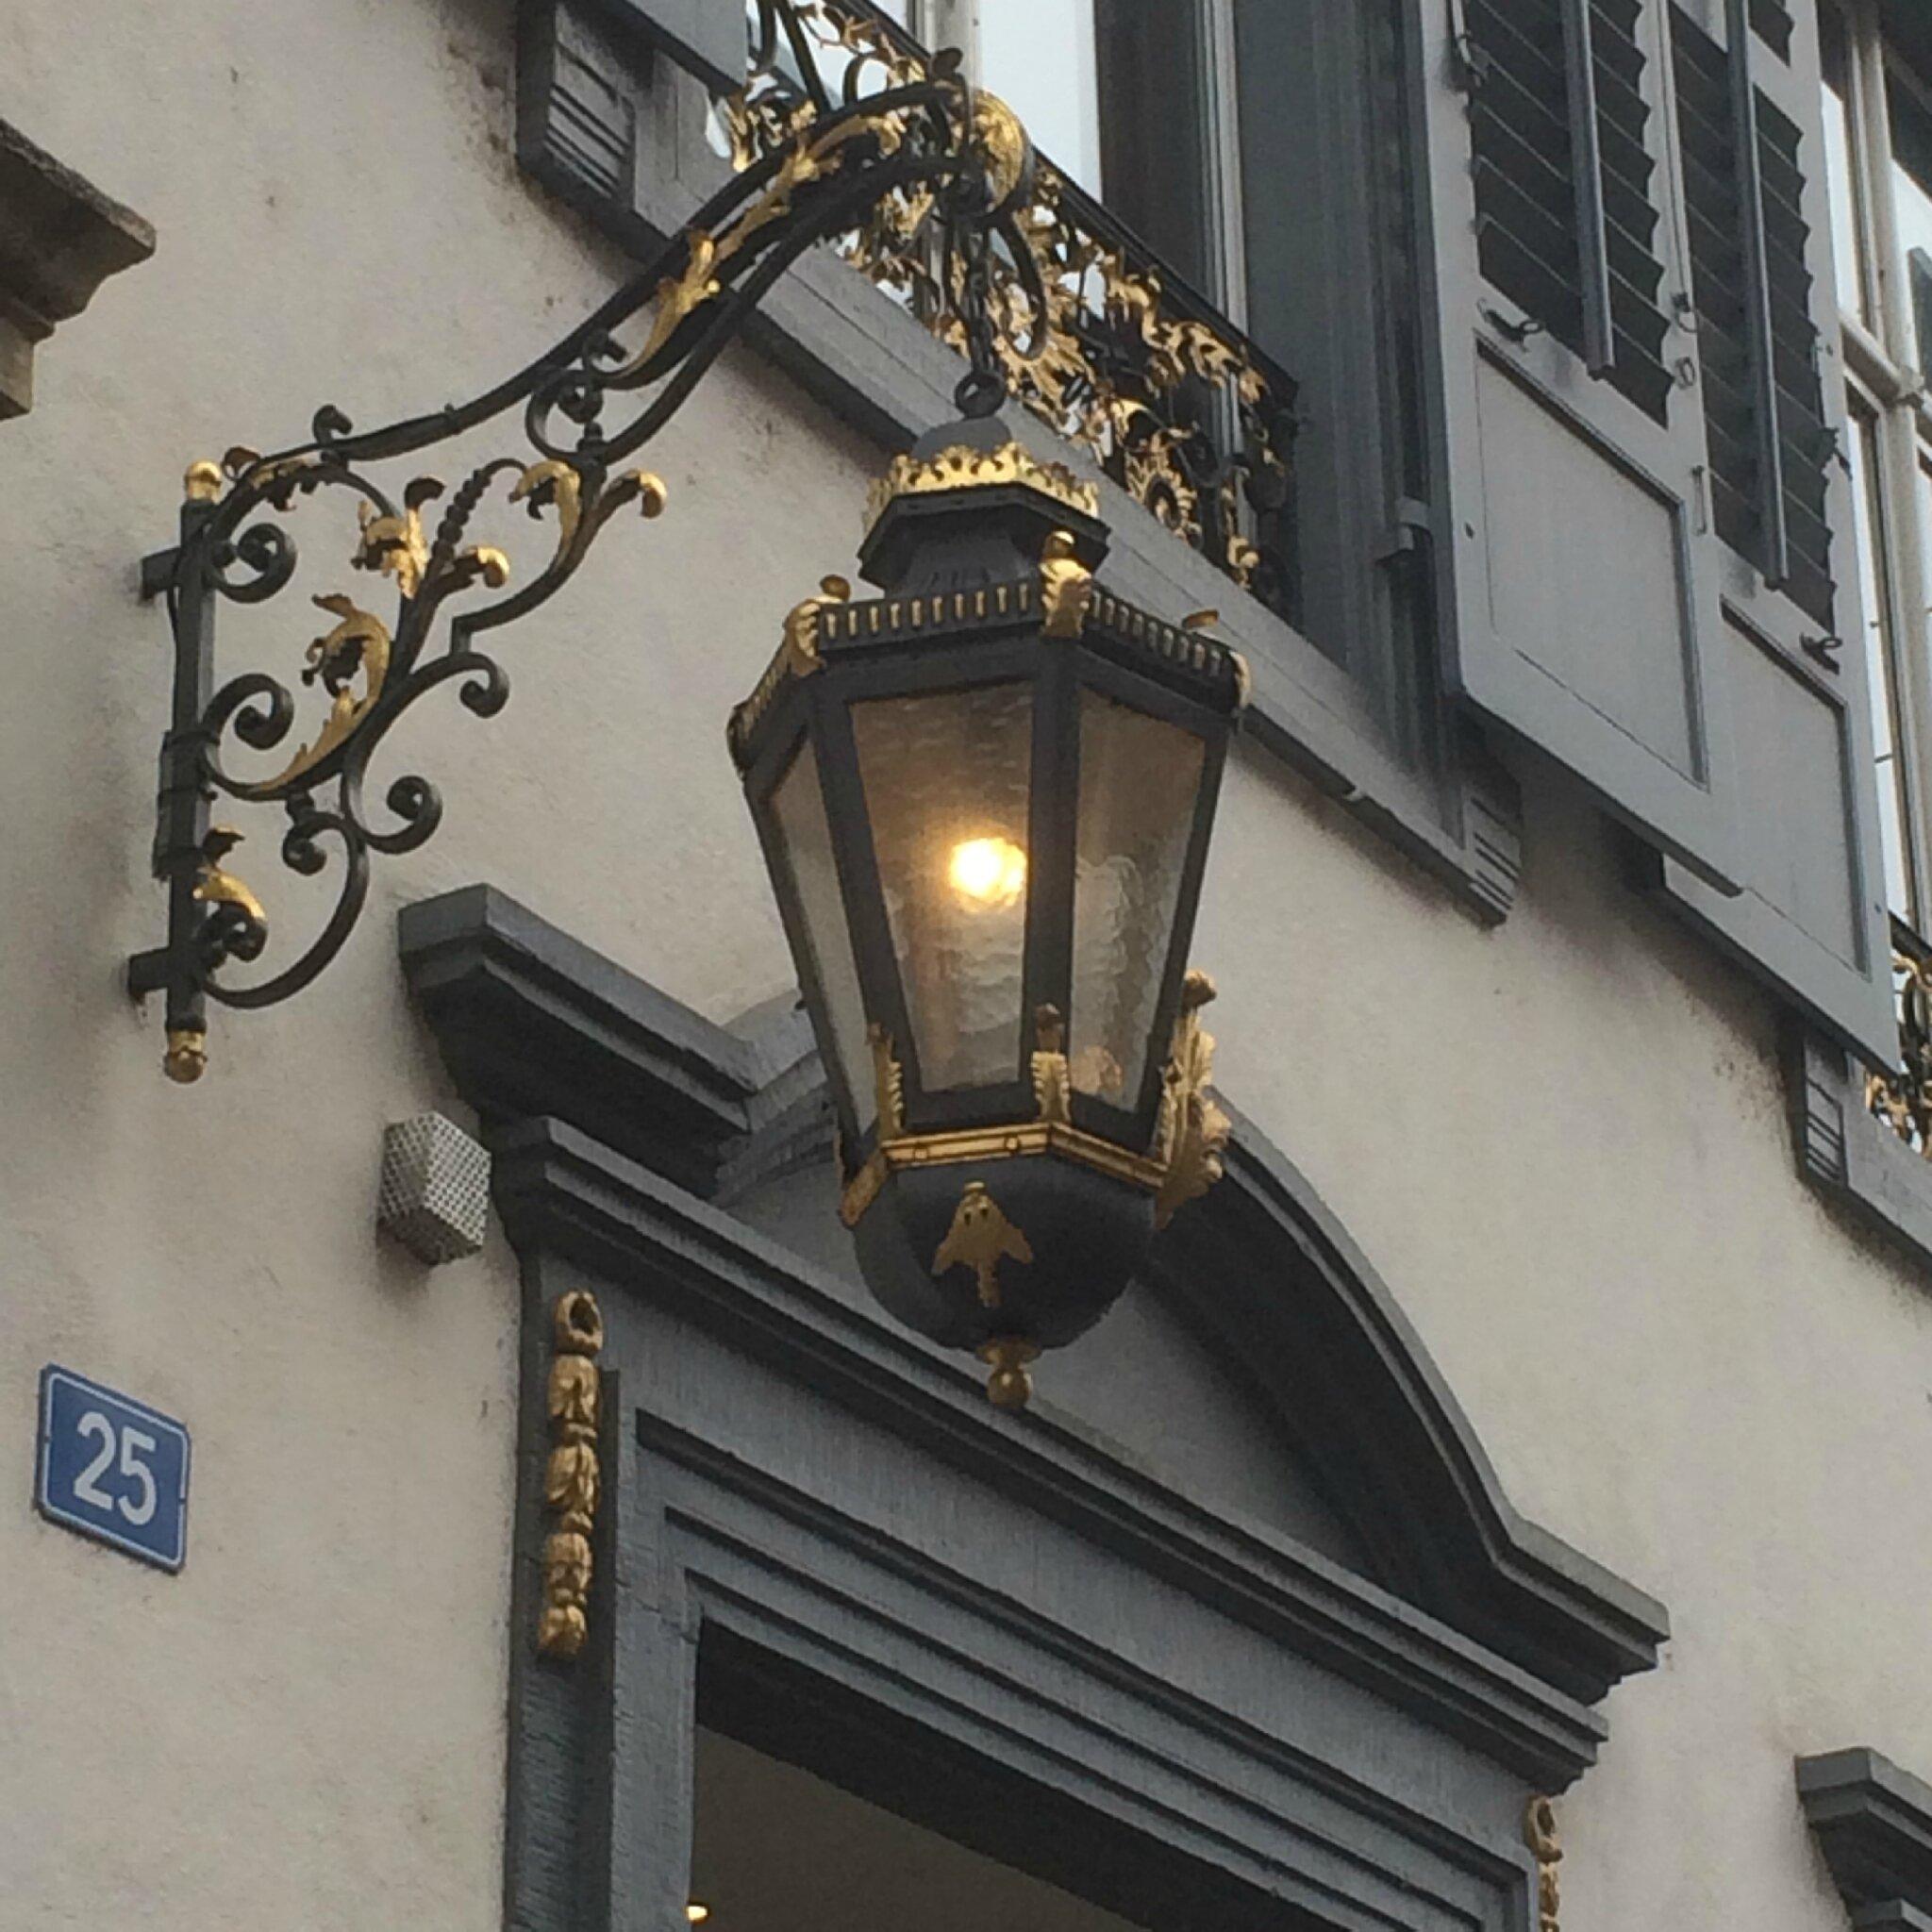 Lanterne En Fer Forge Rehausse D Or Creation Artisanale De